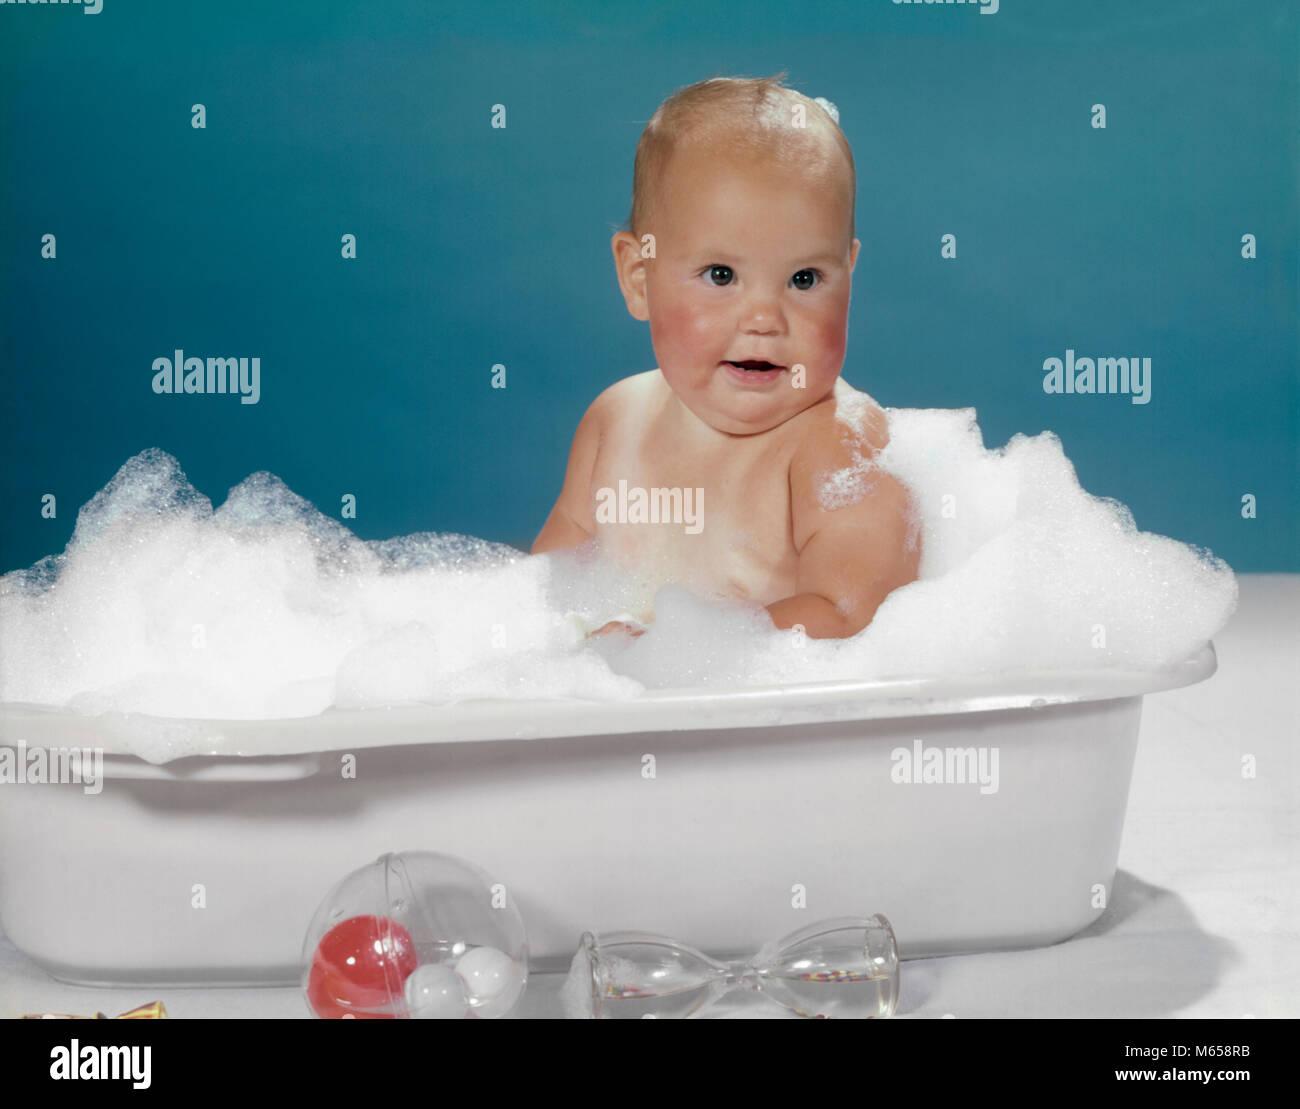 1950s 1960s CLEAN HAPPY BABY SITTING IN PLASTIC BATH TUB BASIN FULL ...